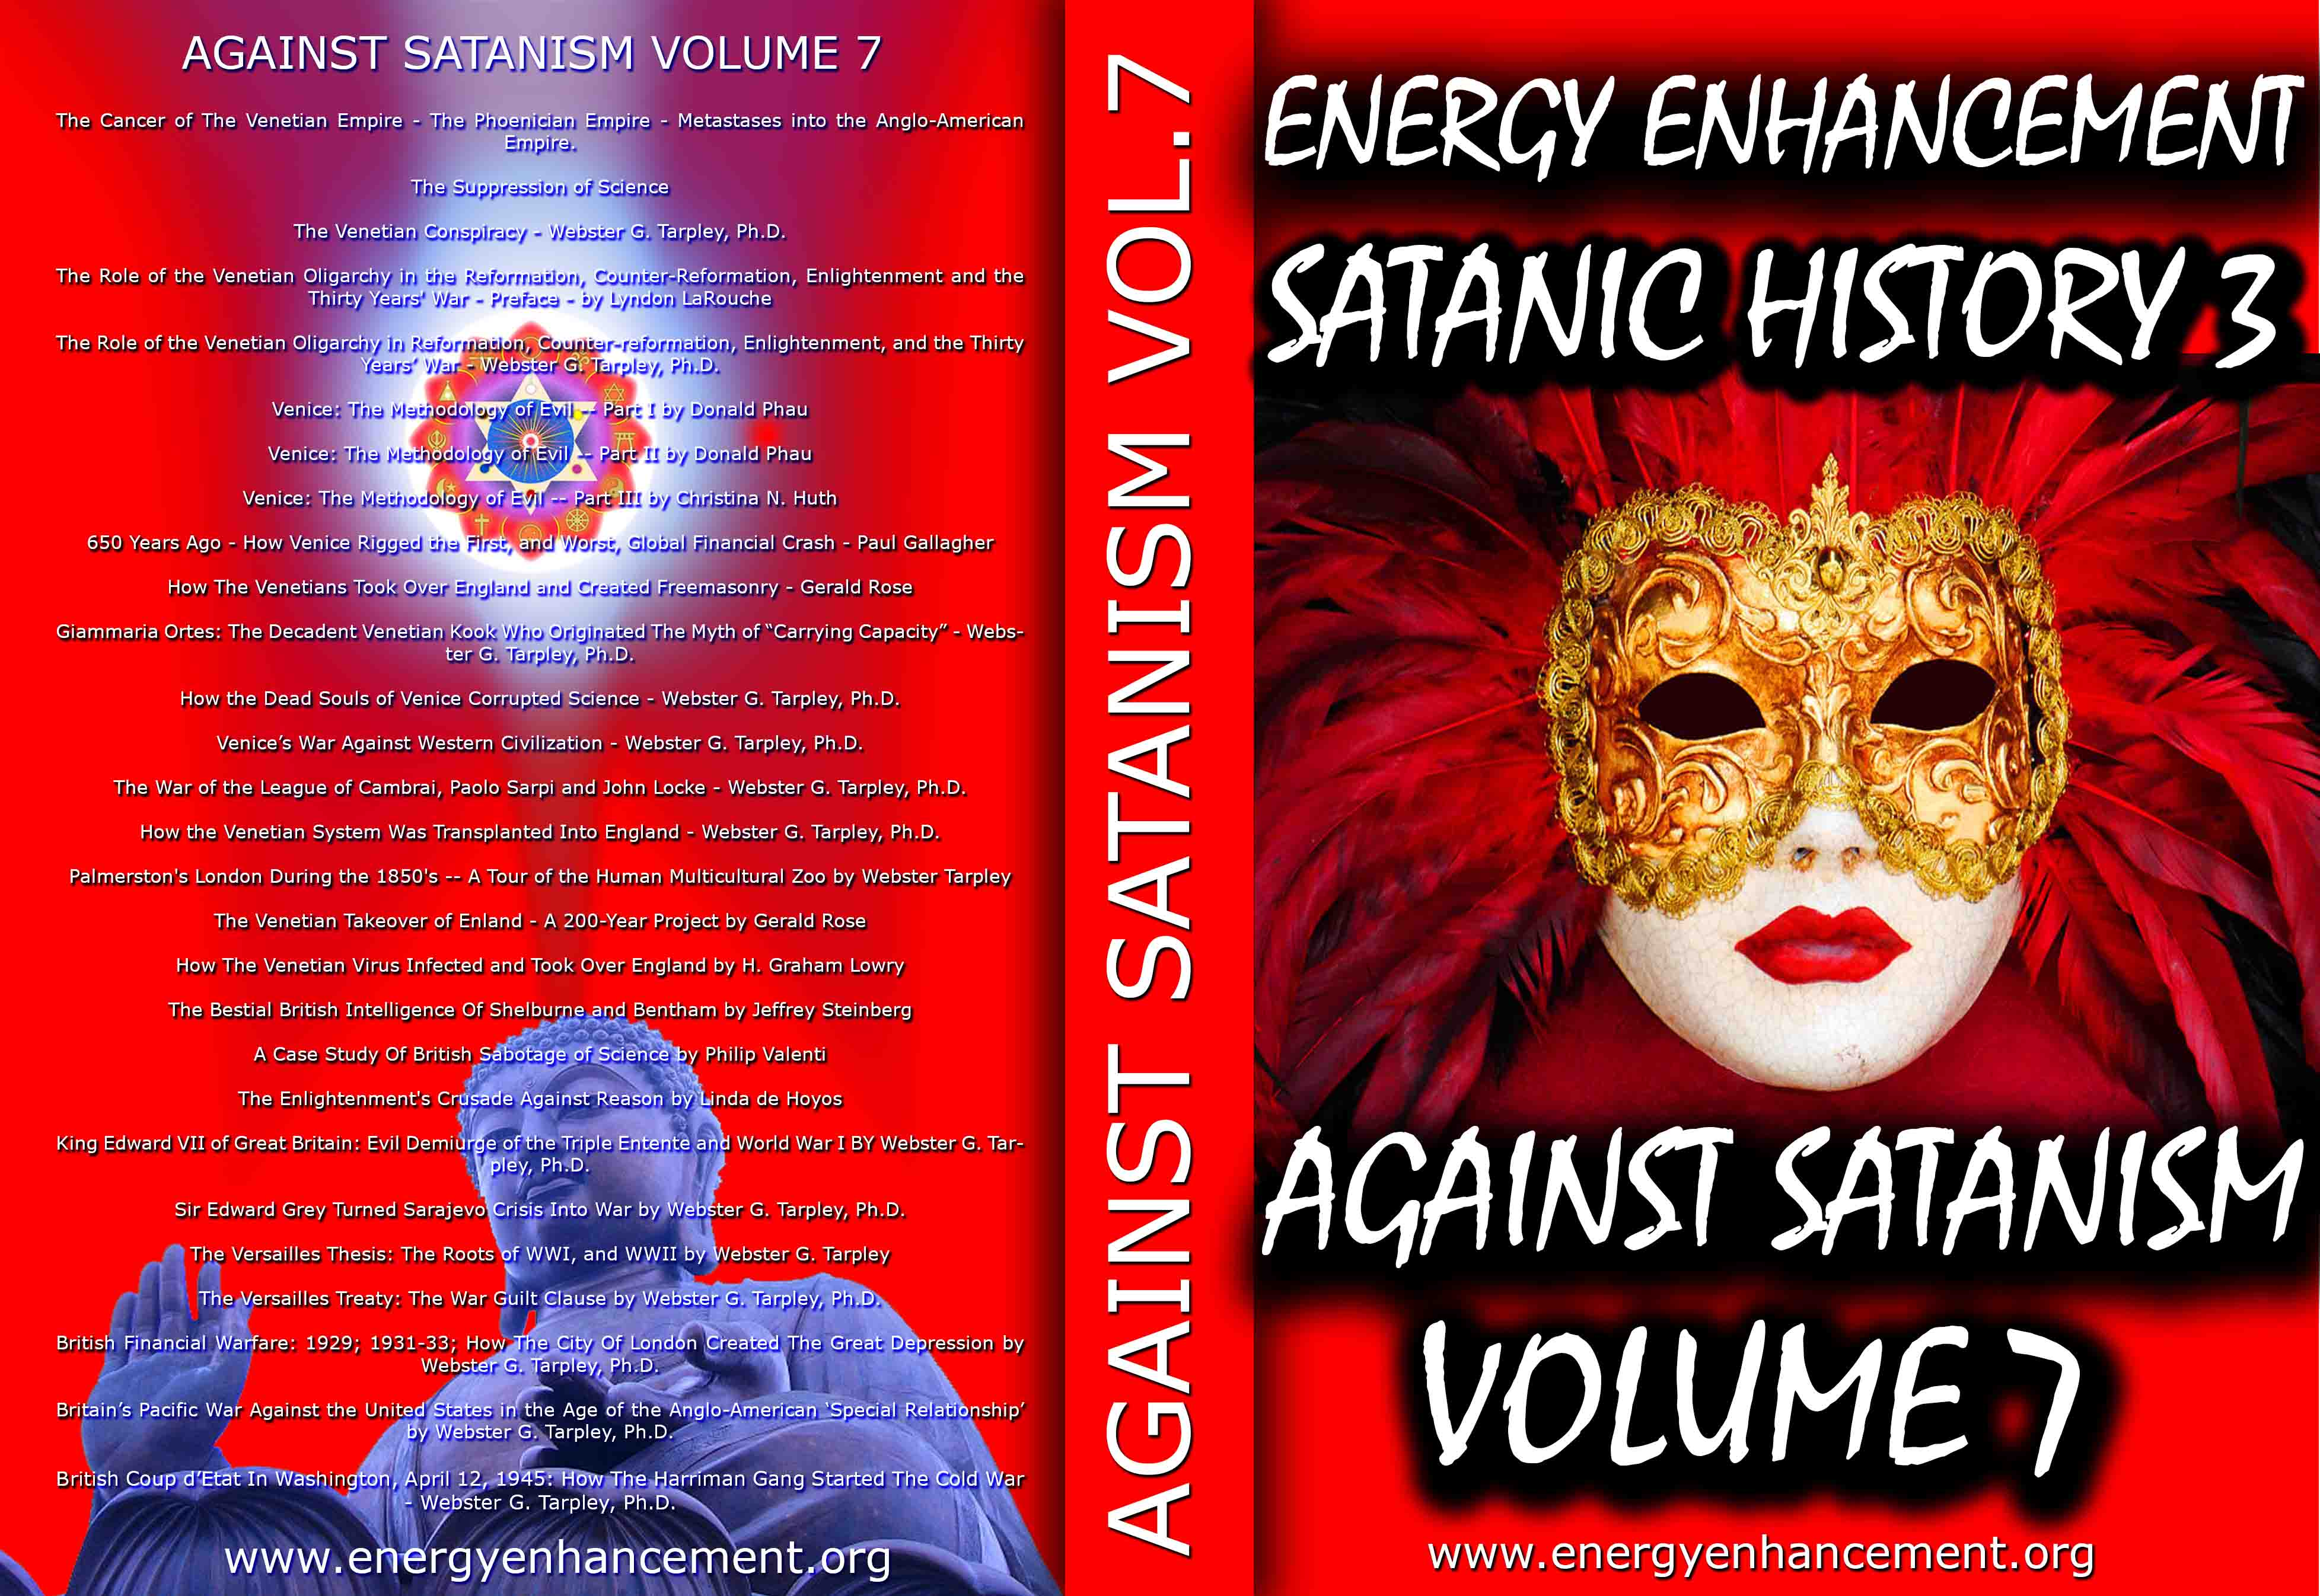 Description: Description: C:\wnew\Sacred-Energy\Against-Satanism-Volume-7\VOL 7 FULL.jpg